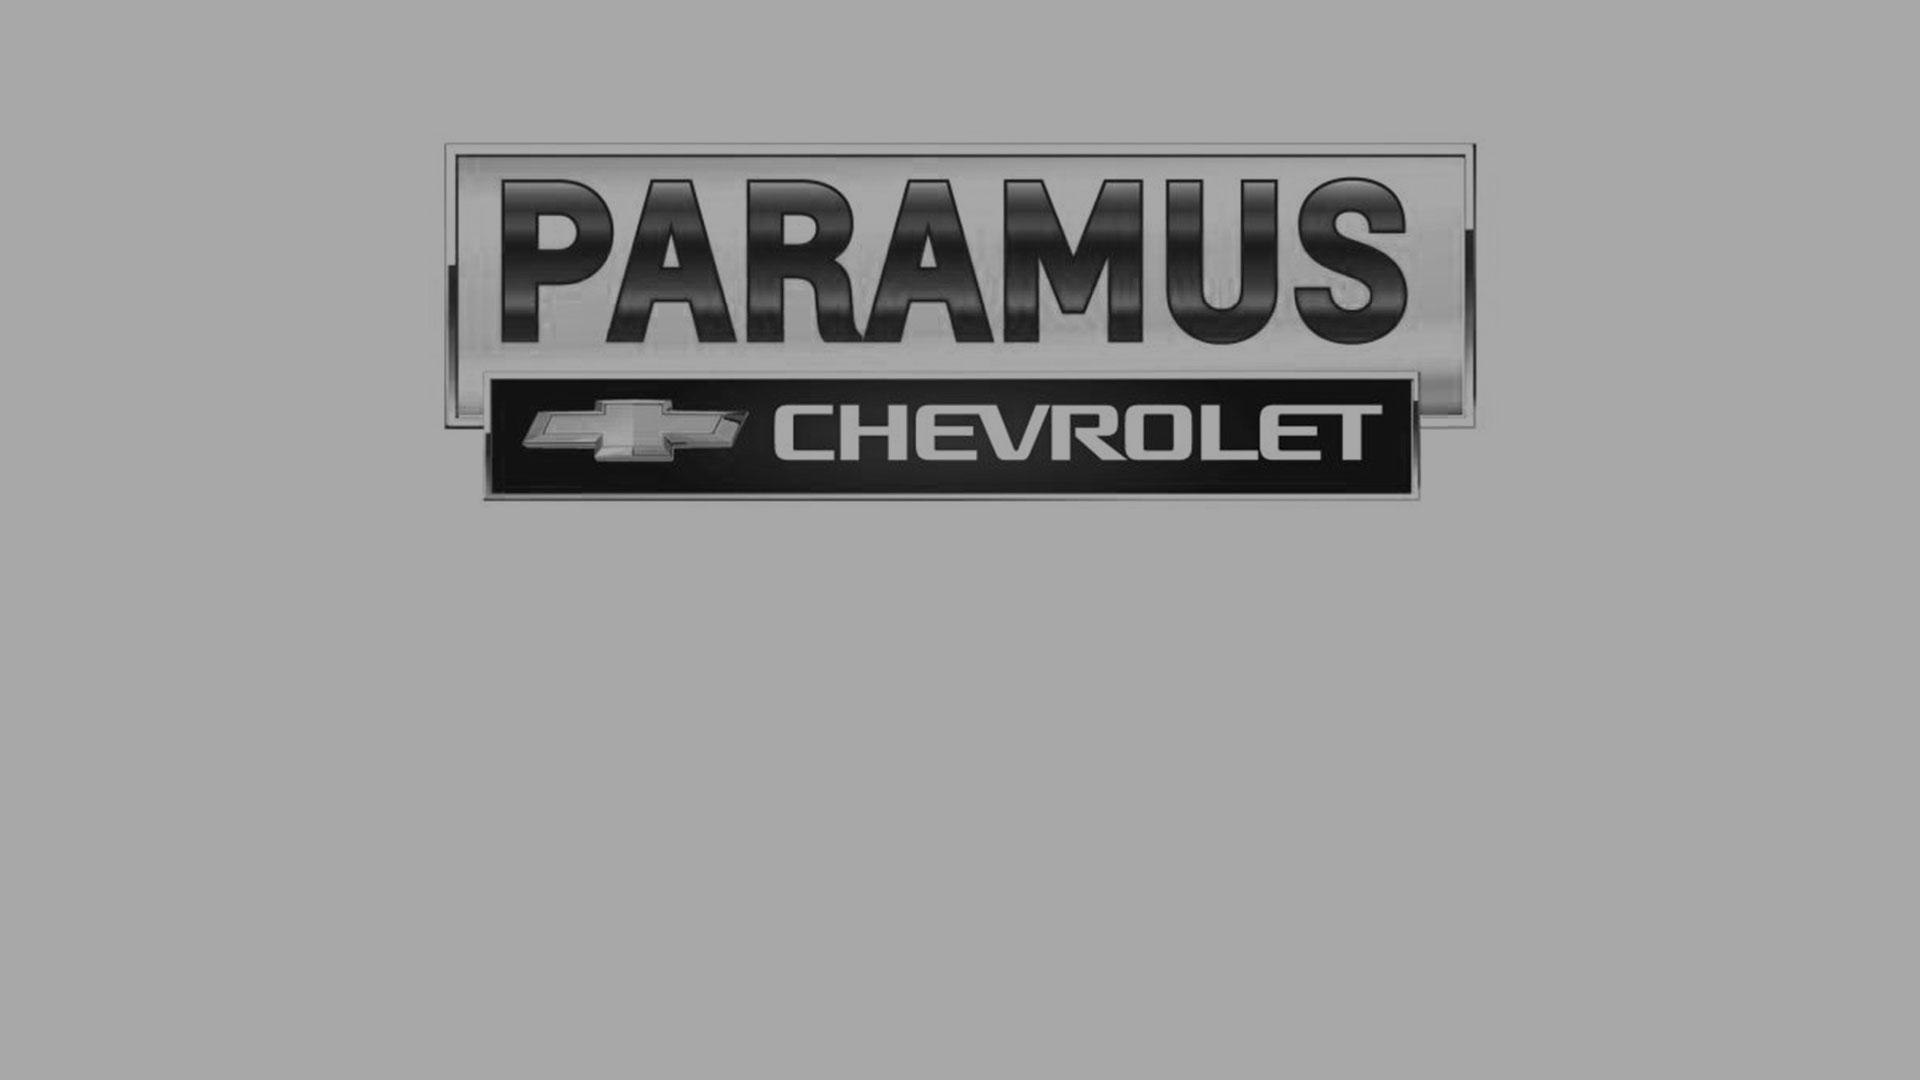 Paramus Chevrolet logo